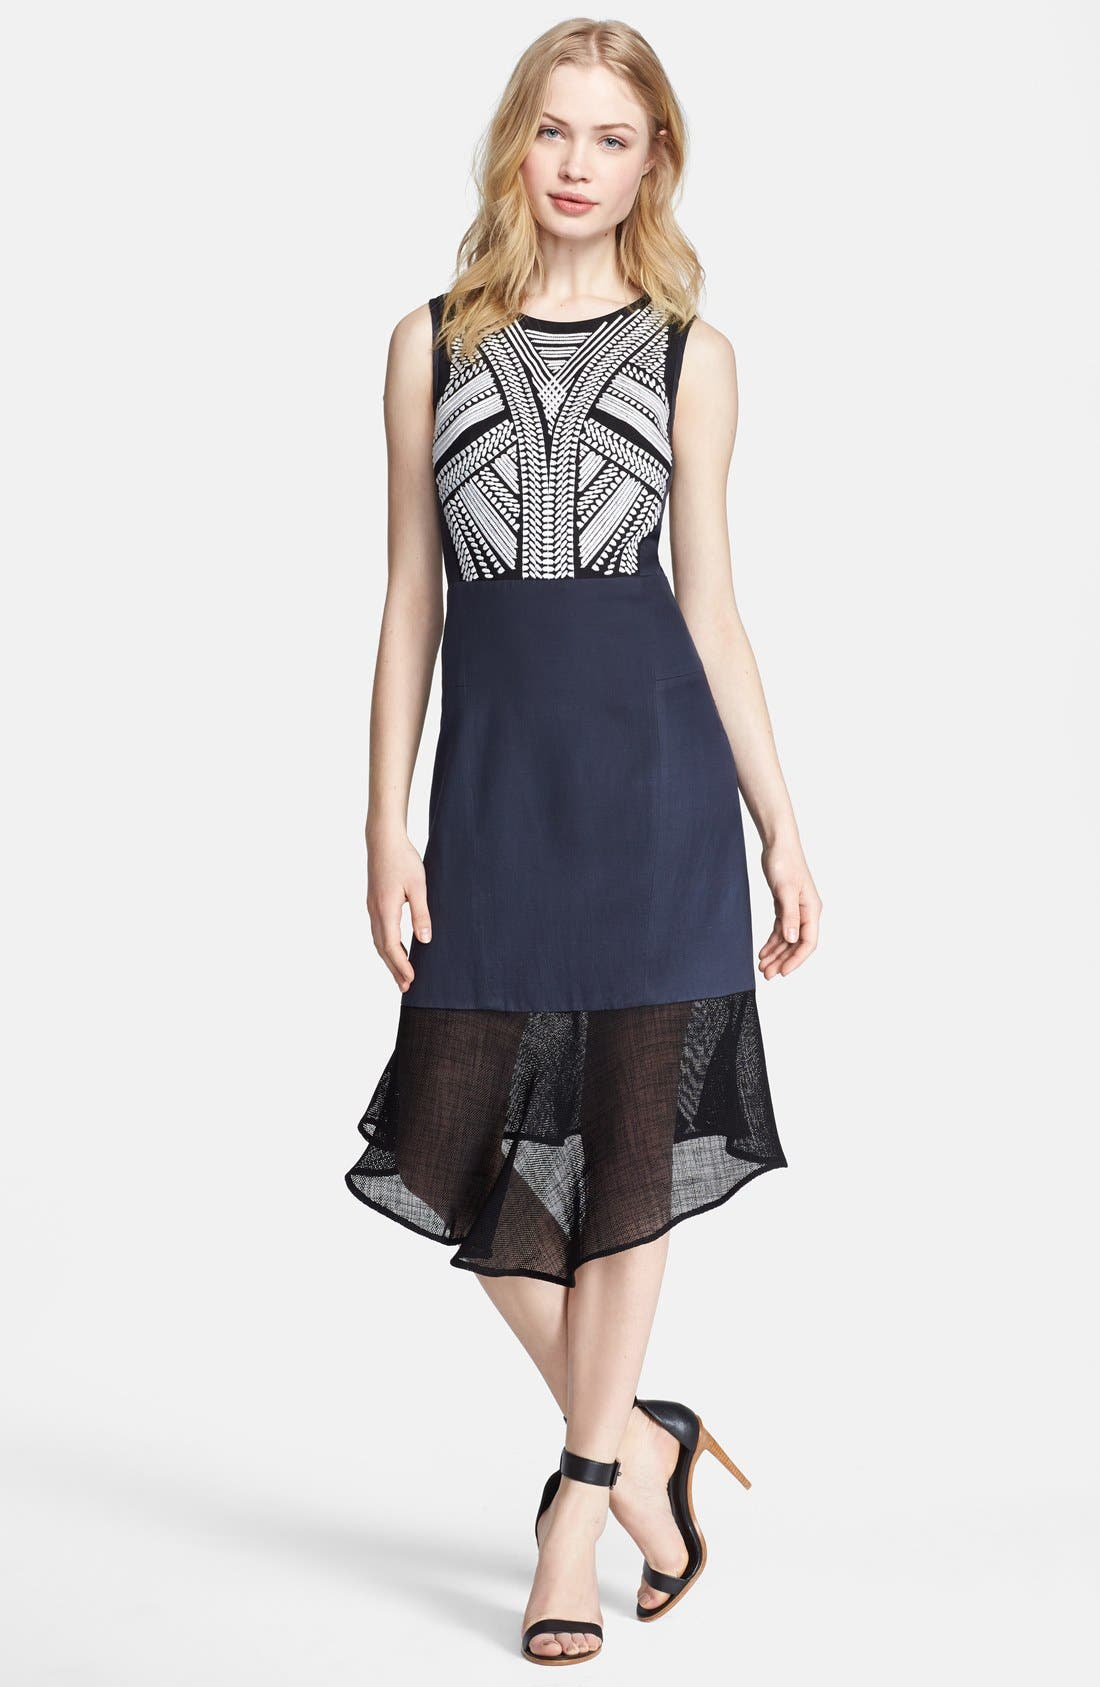 Alternate Image 1 Selected - Tibi 'Fog' Embroidered A-Line Dress